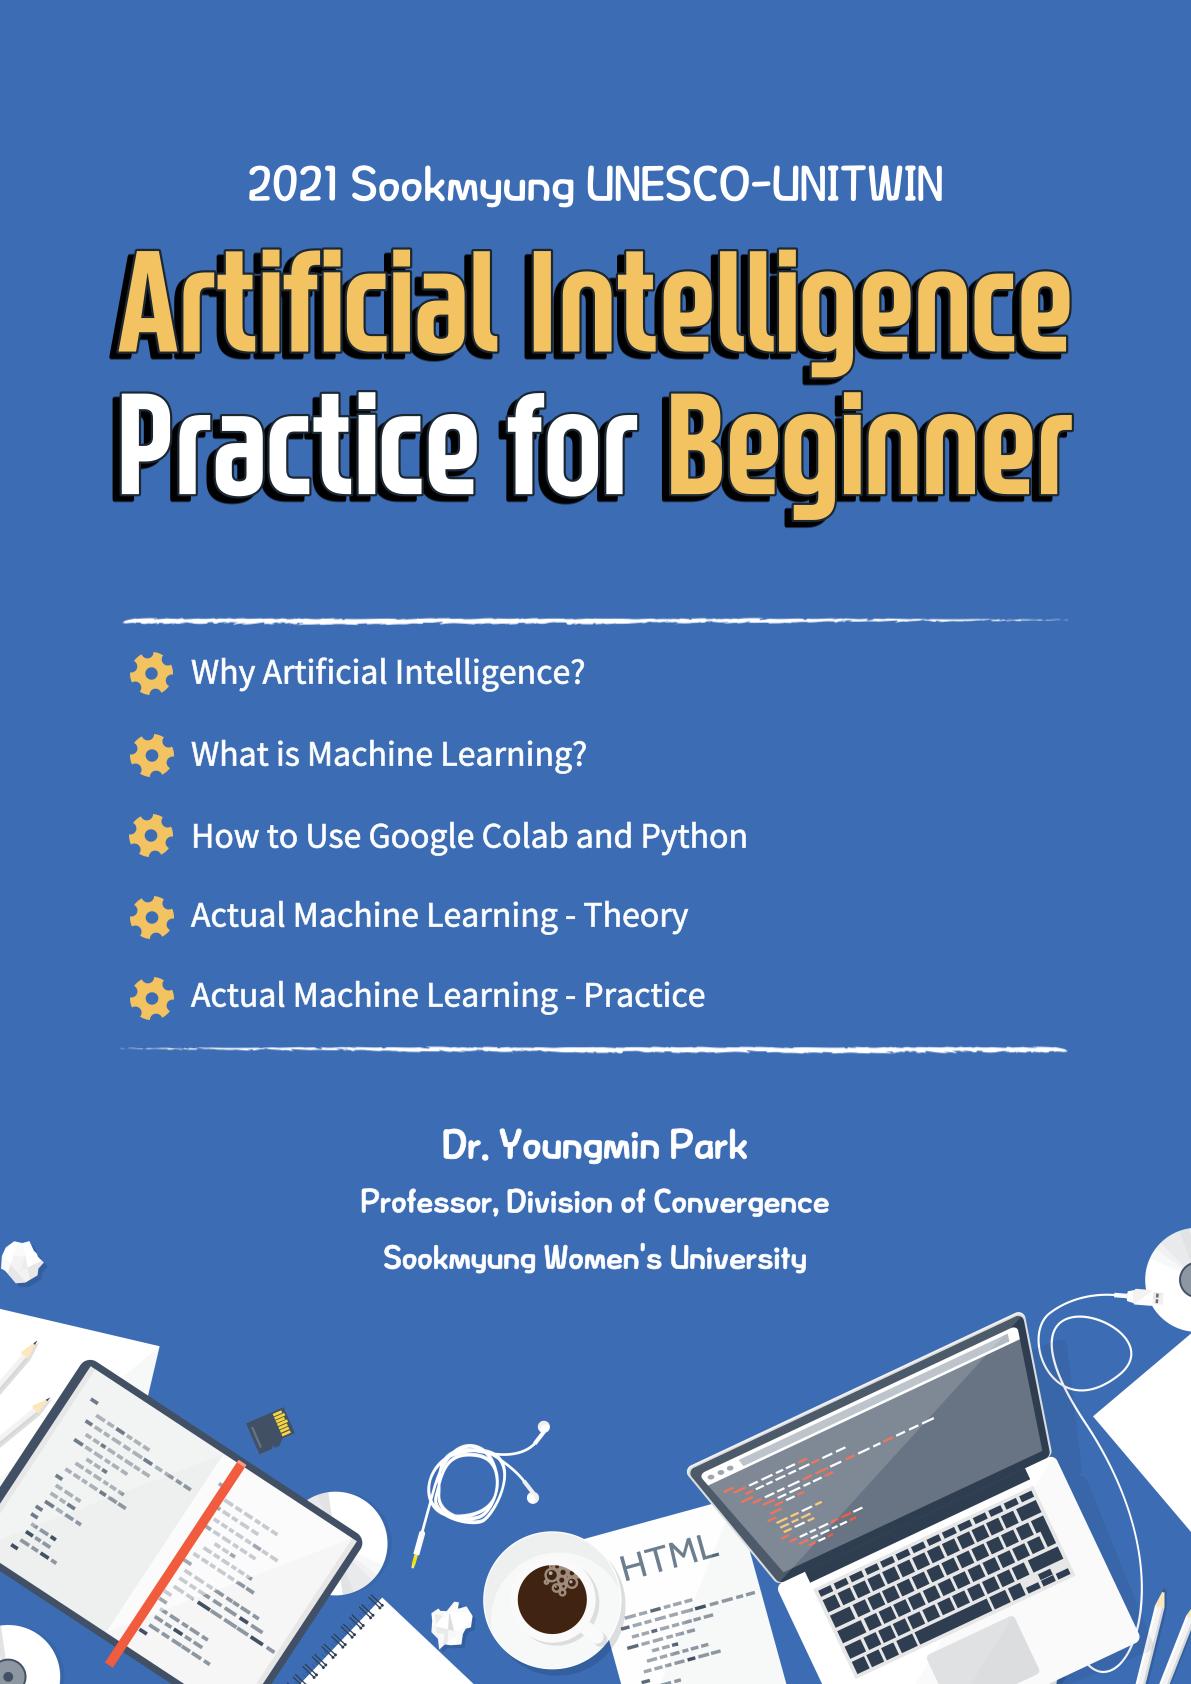 Artificial Intelligence Practice for Beginner